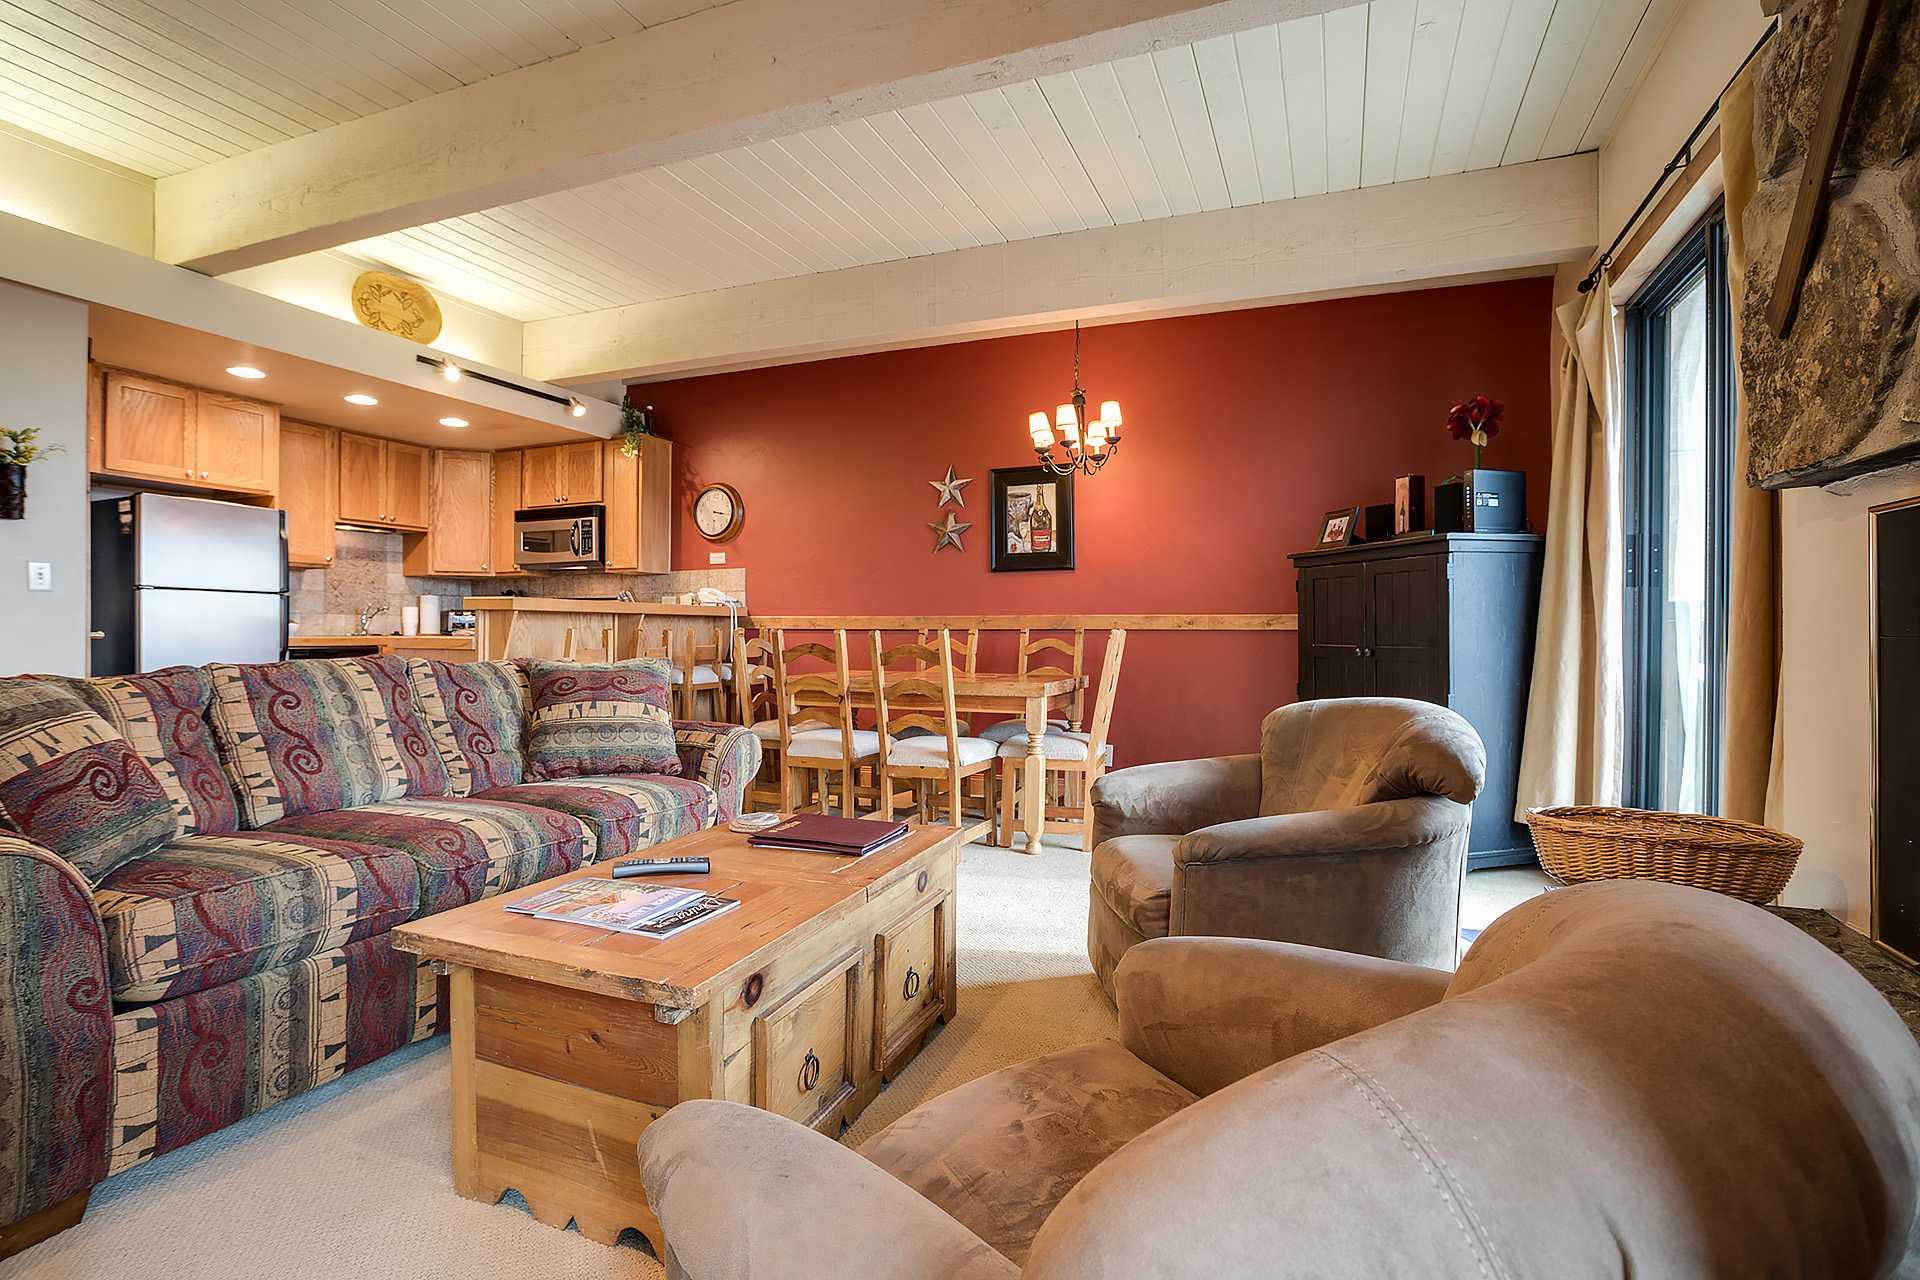 CA313: Storm Meadows Club A Condominiums